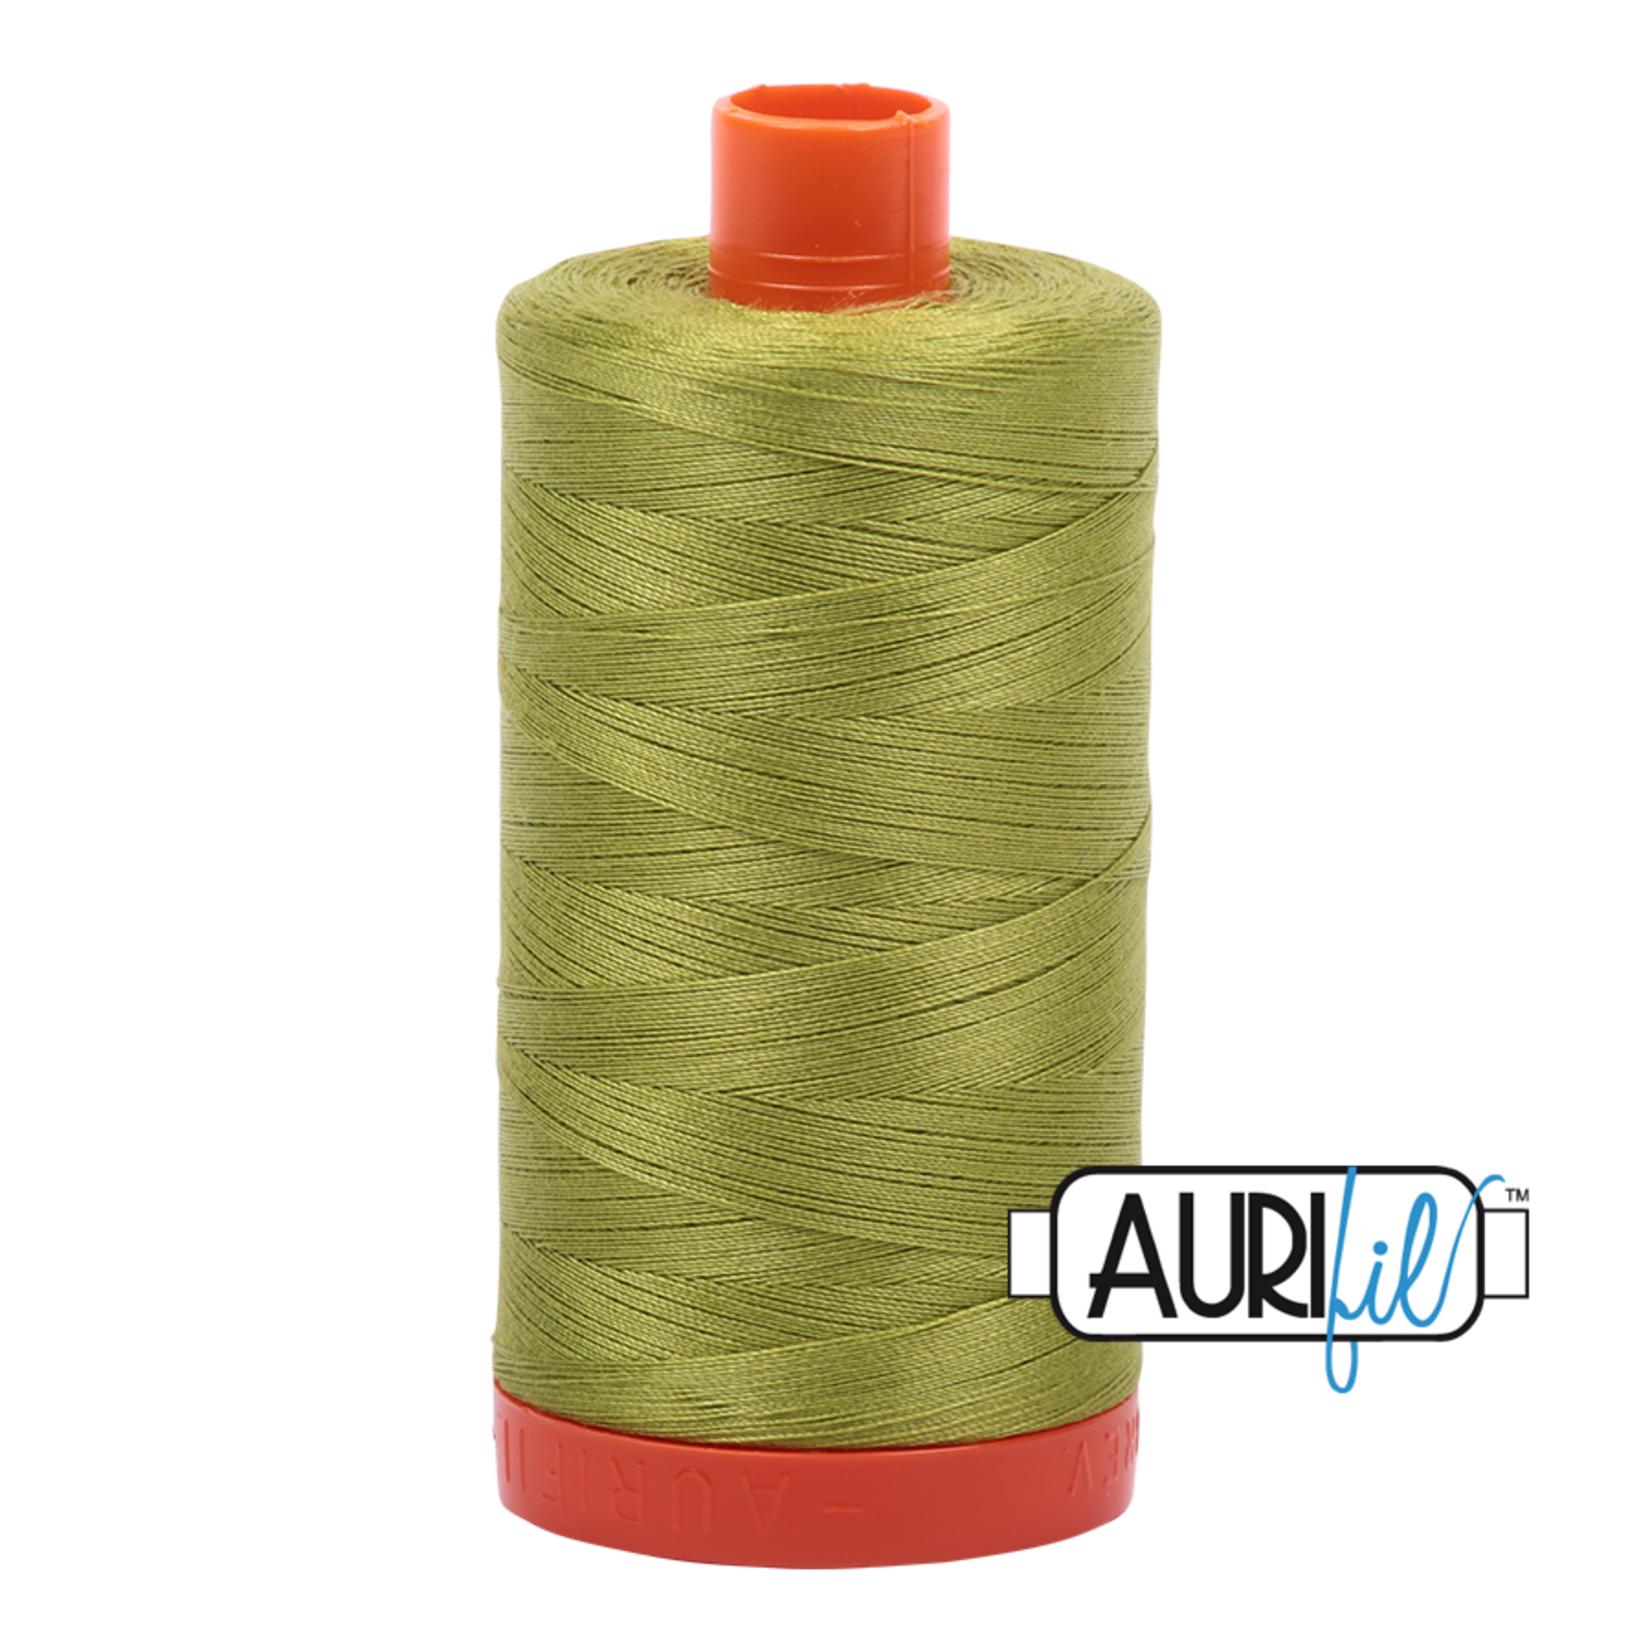 AURIFIL AURIFIL 50 WT Light Leaf Green 1147